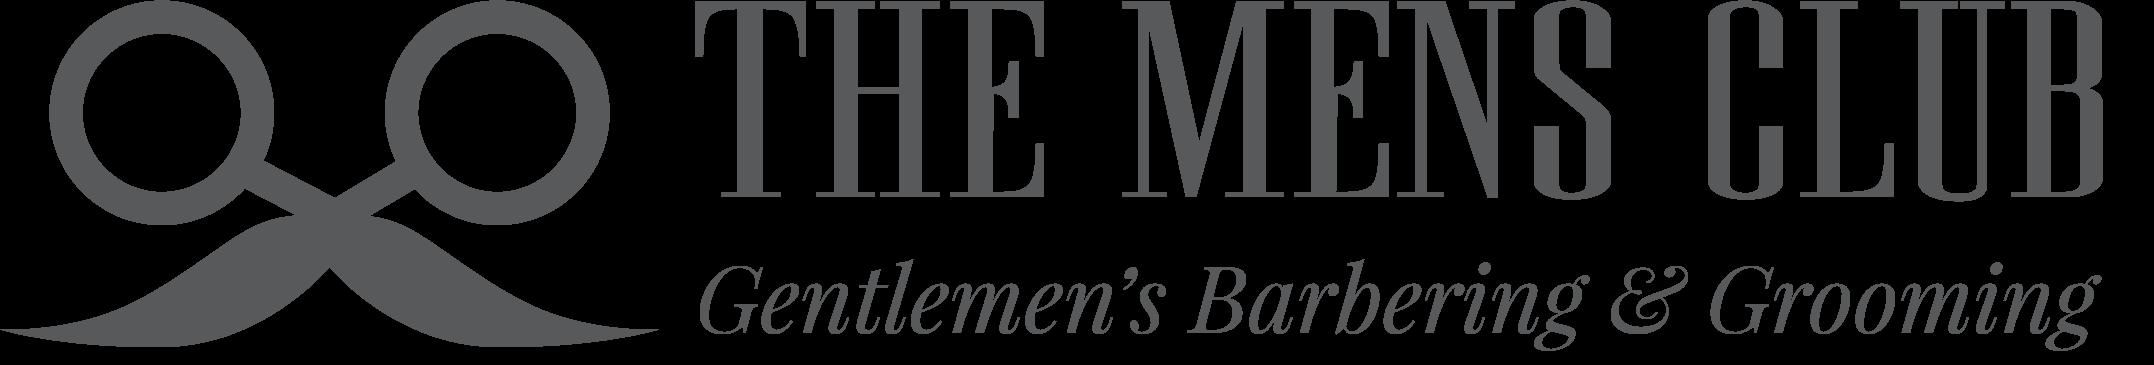 mens-club-page-logo-grey